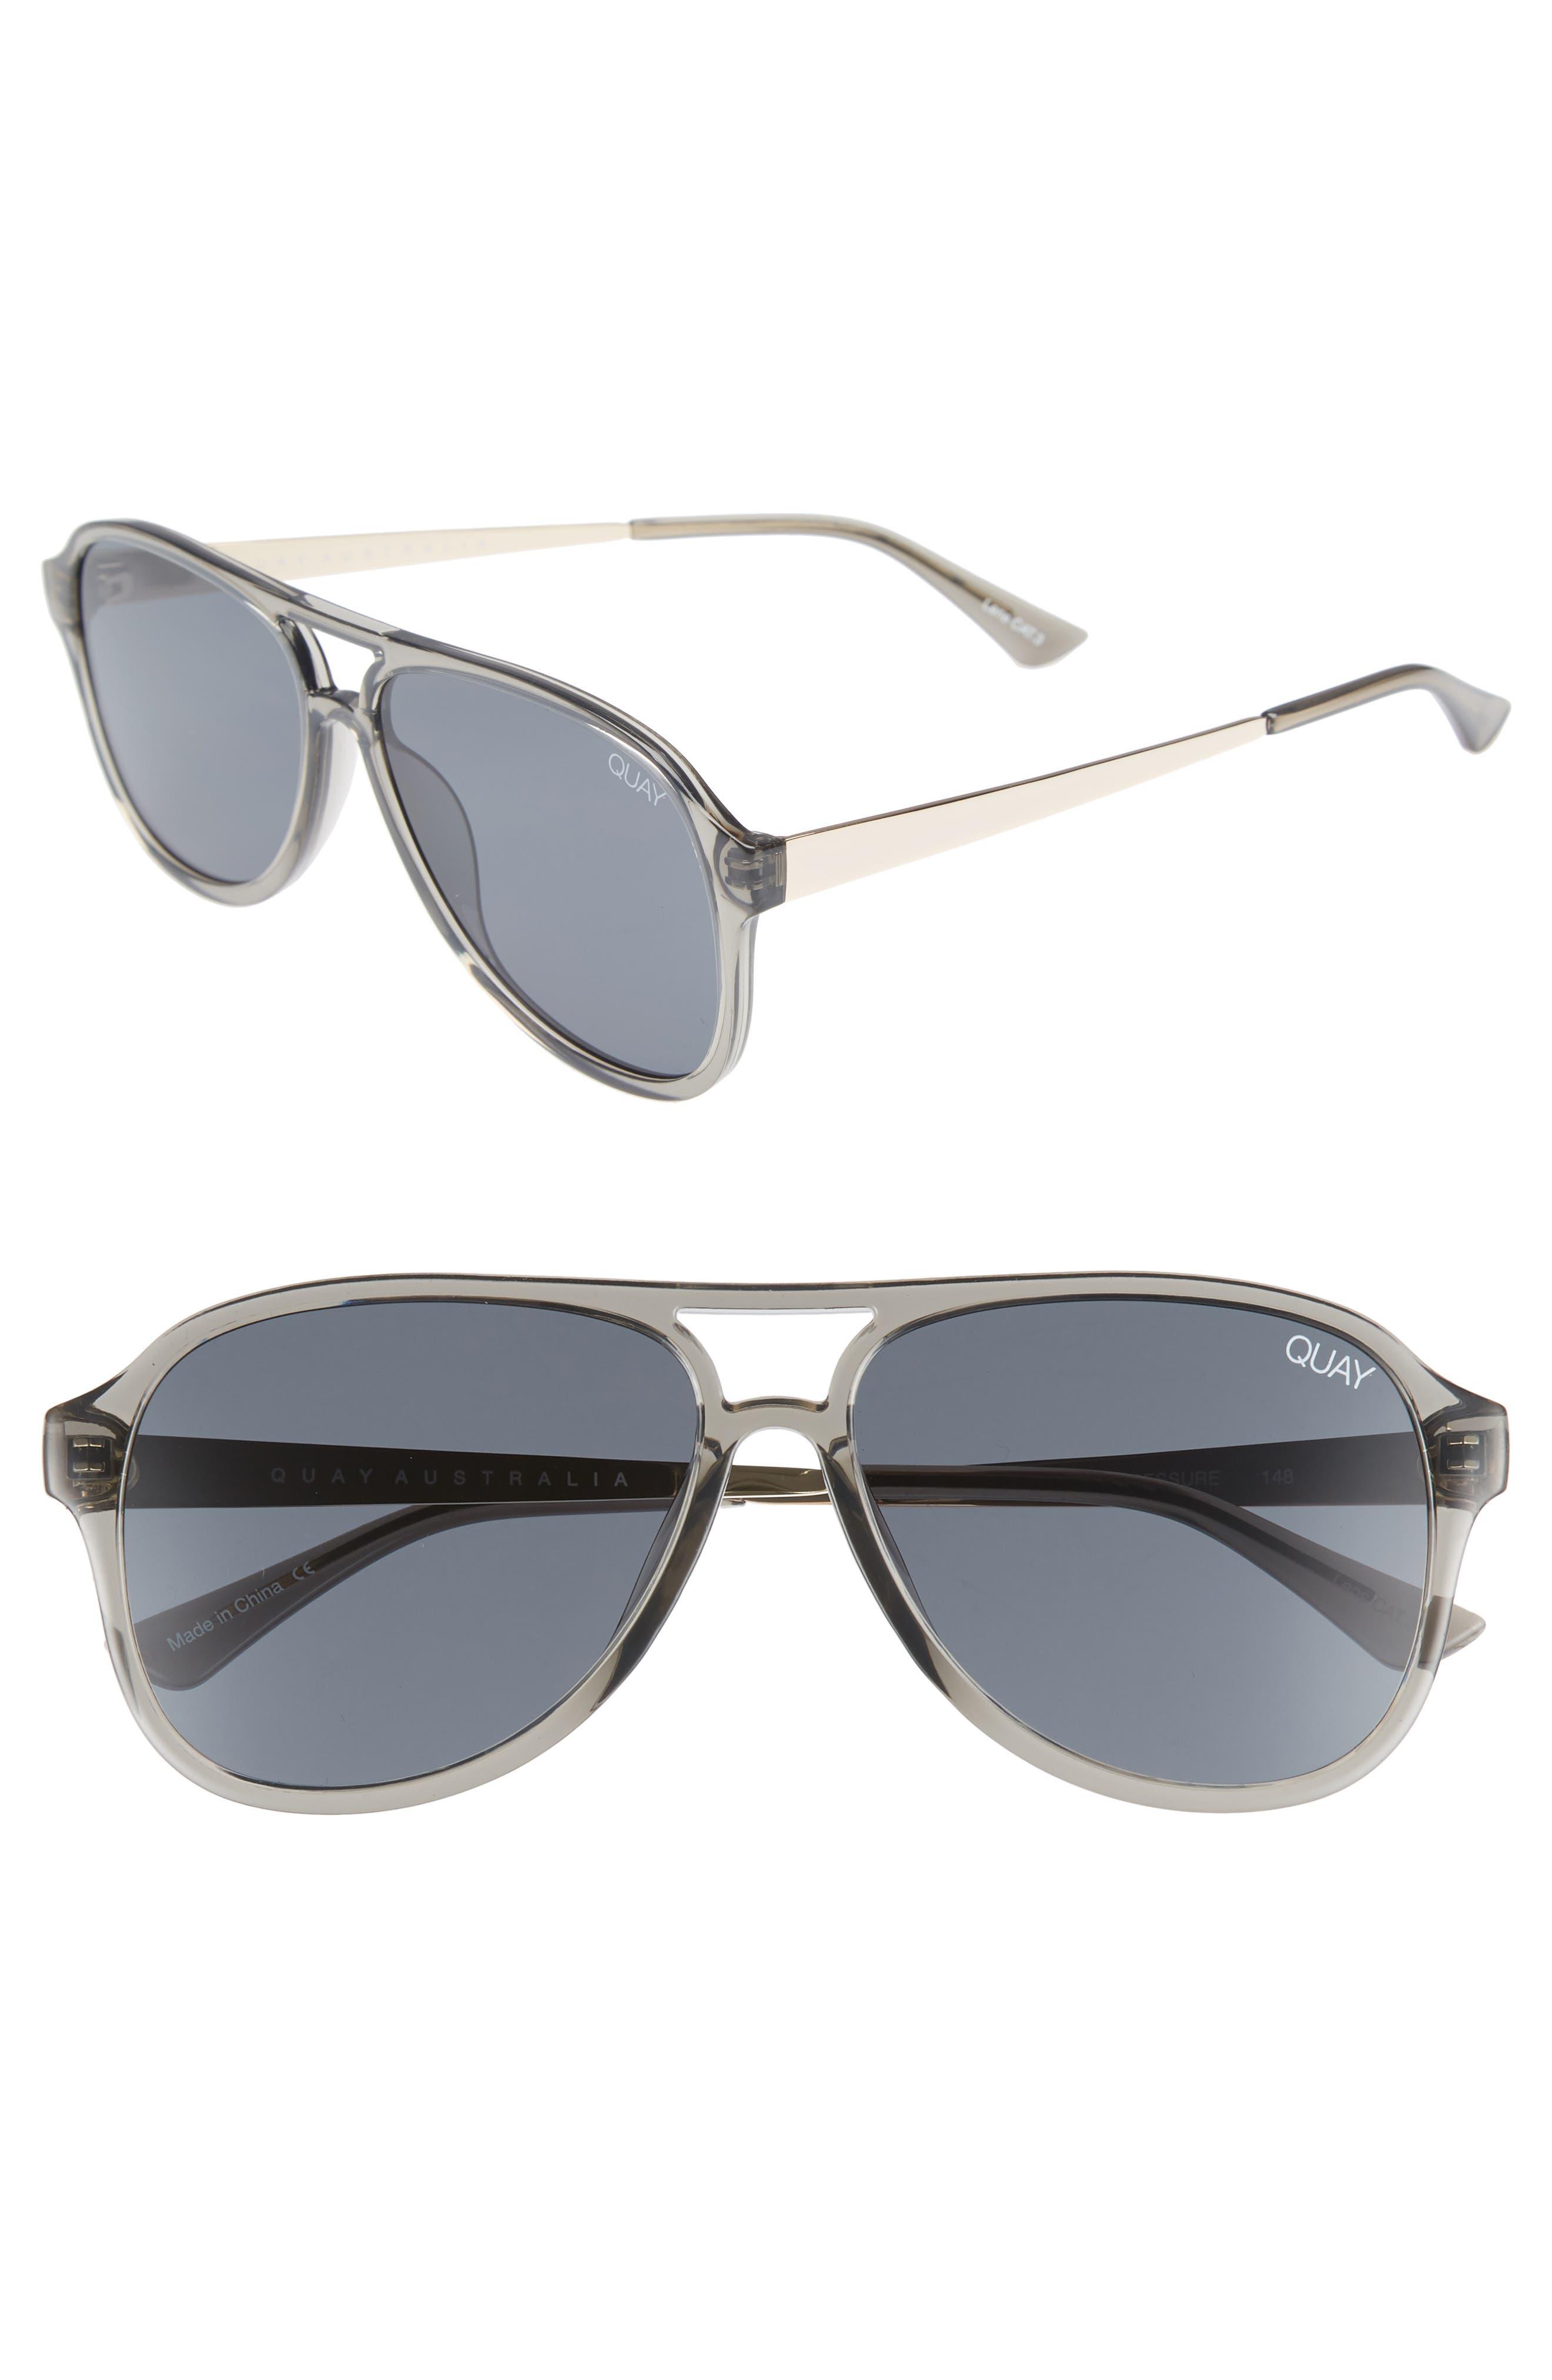 Under Pressure 58mm Aviator Sunglasses,                             Main thumbnail 1, color,                             GREY/ SMOKE